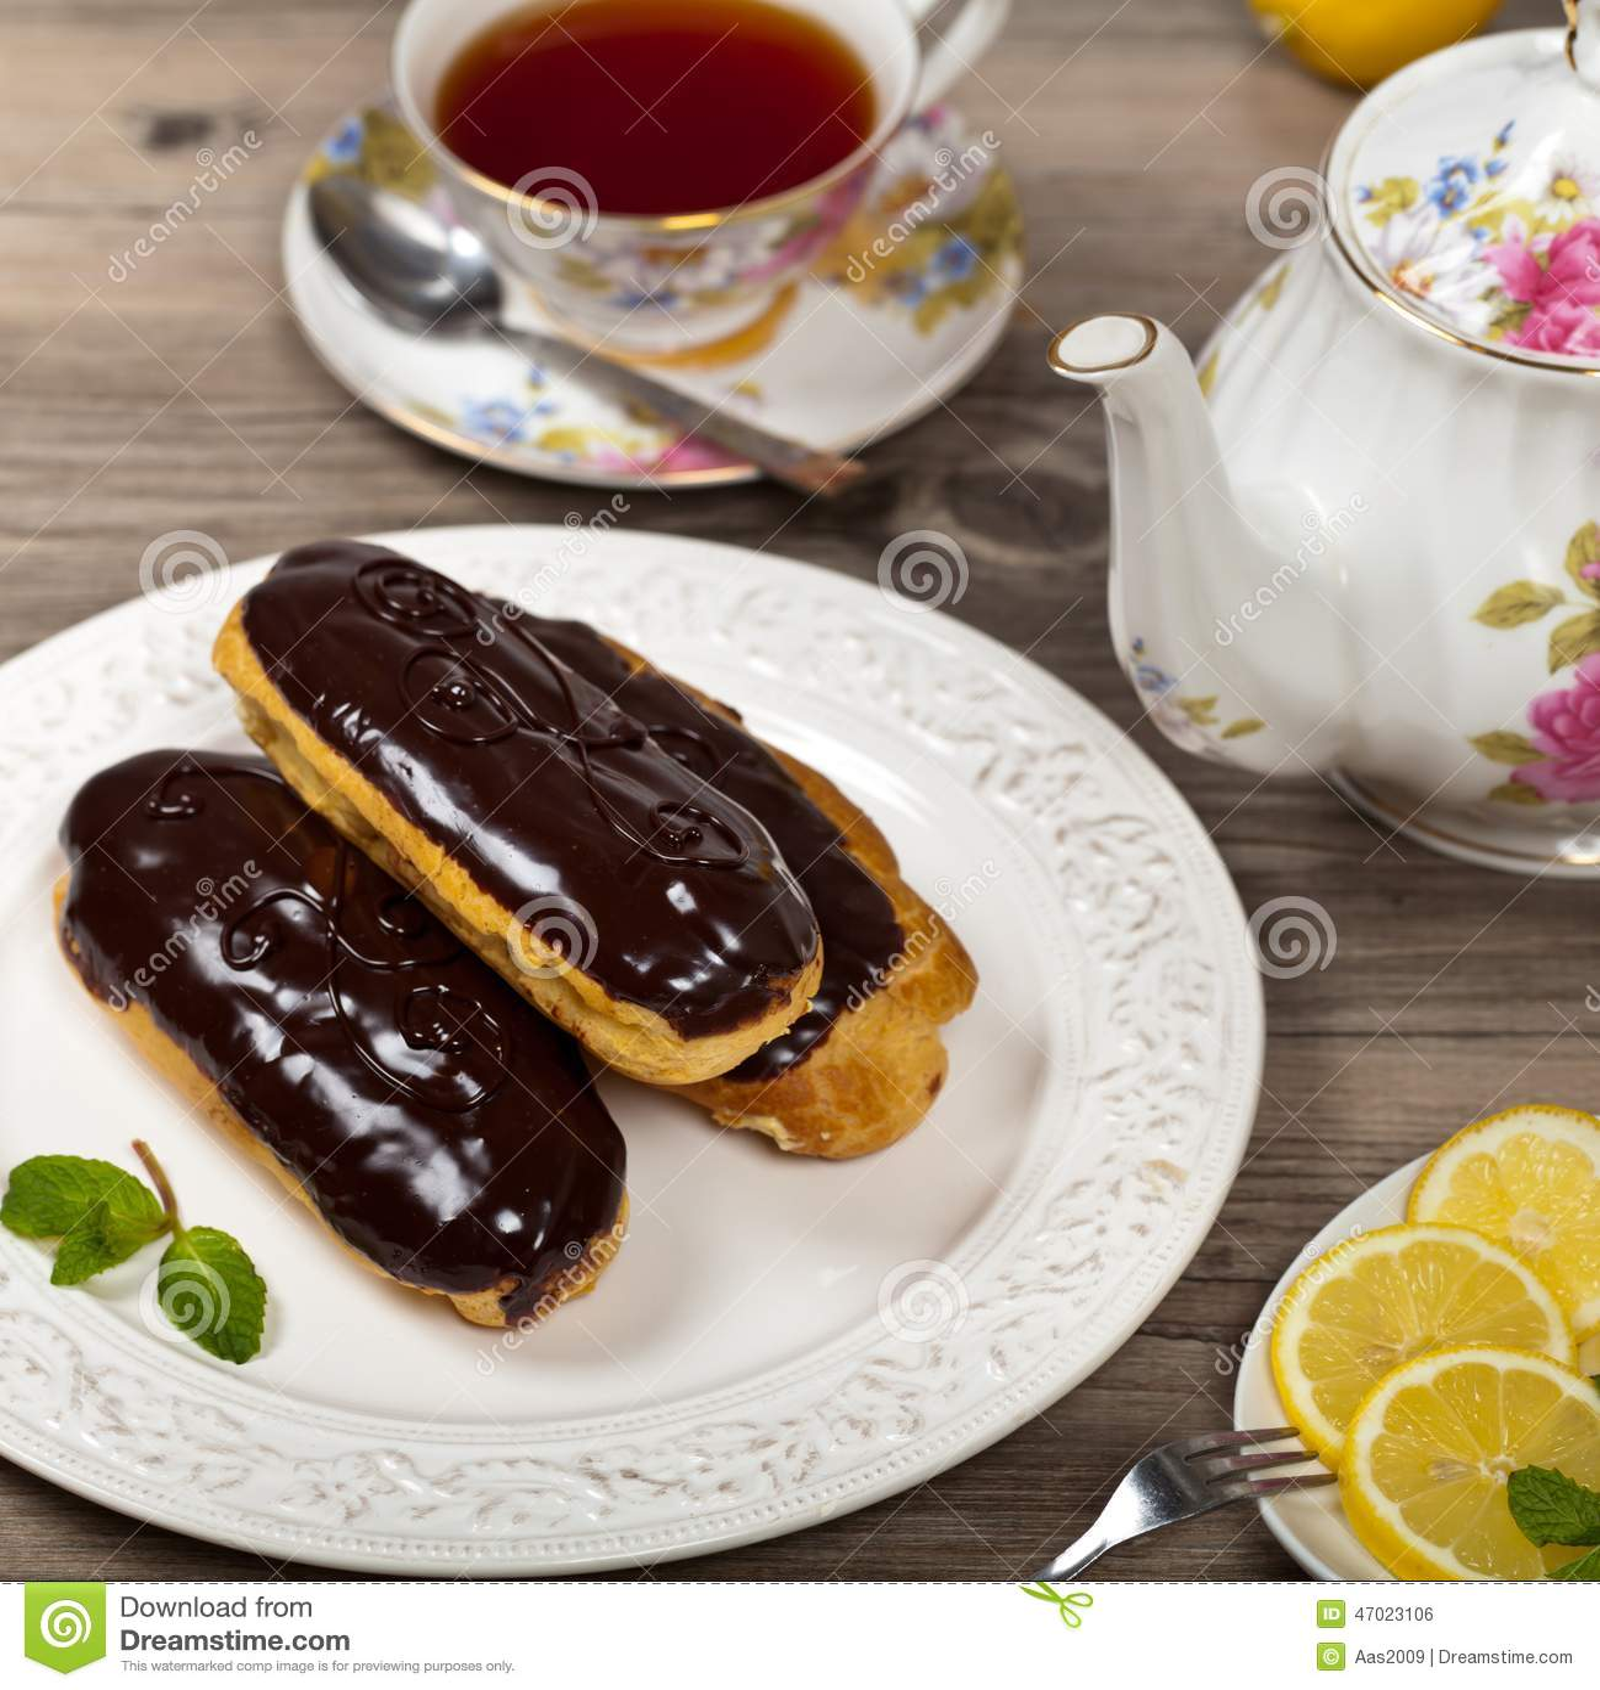 Chocolate Eclair Dessert Stock Photo - Image: 47023106